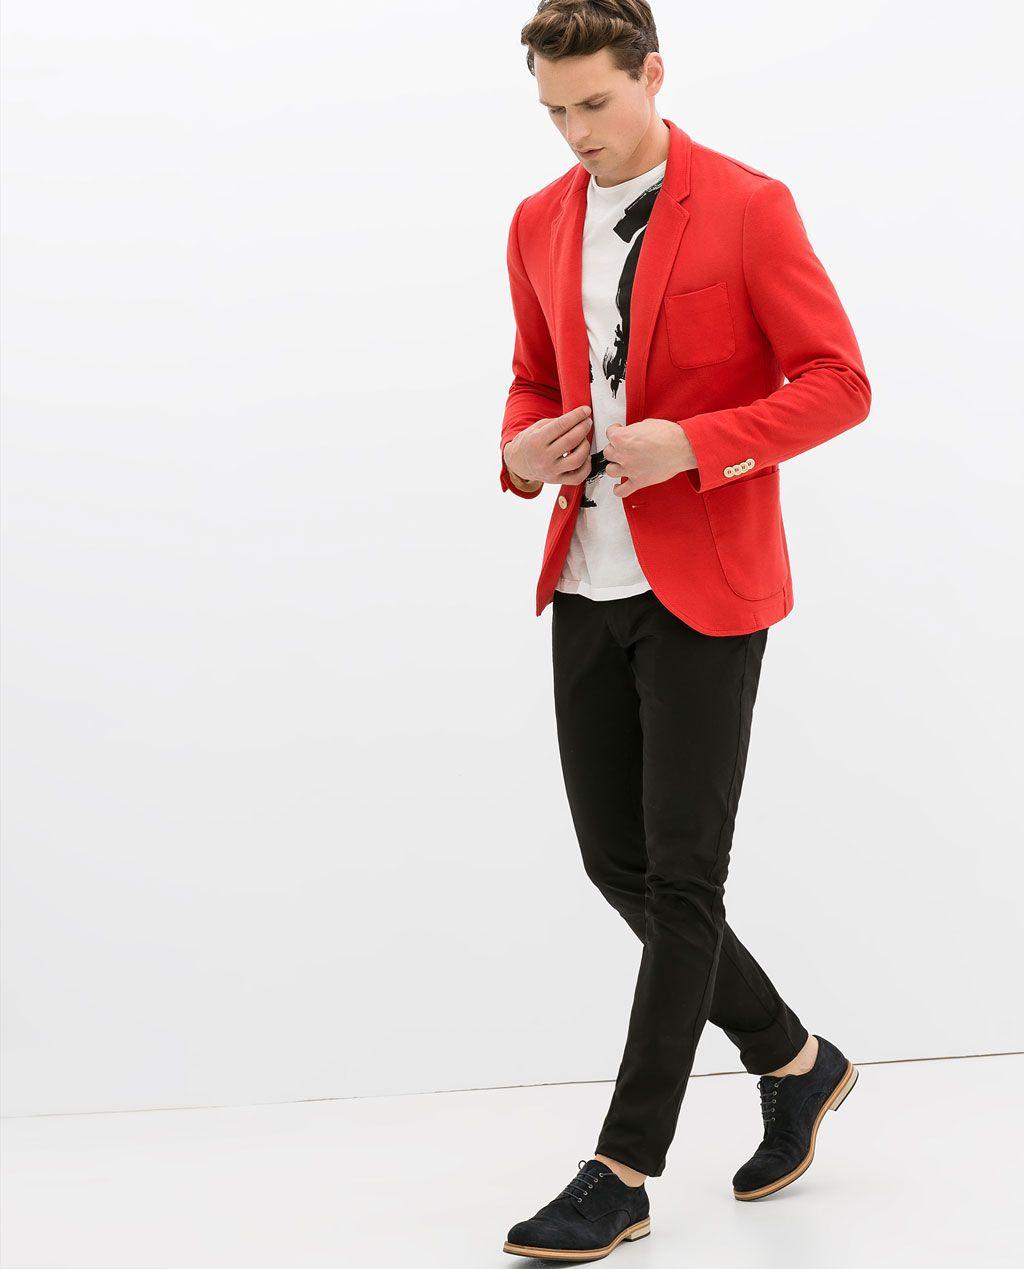 Moda Zara Outfits Blazer Piqué Man Pinterest Masculina wgAgqPXx